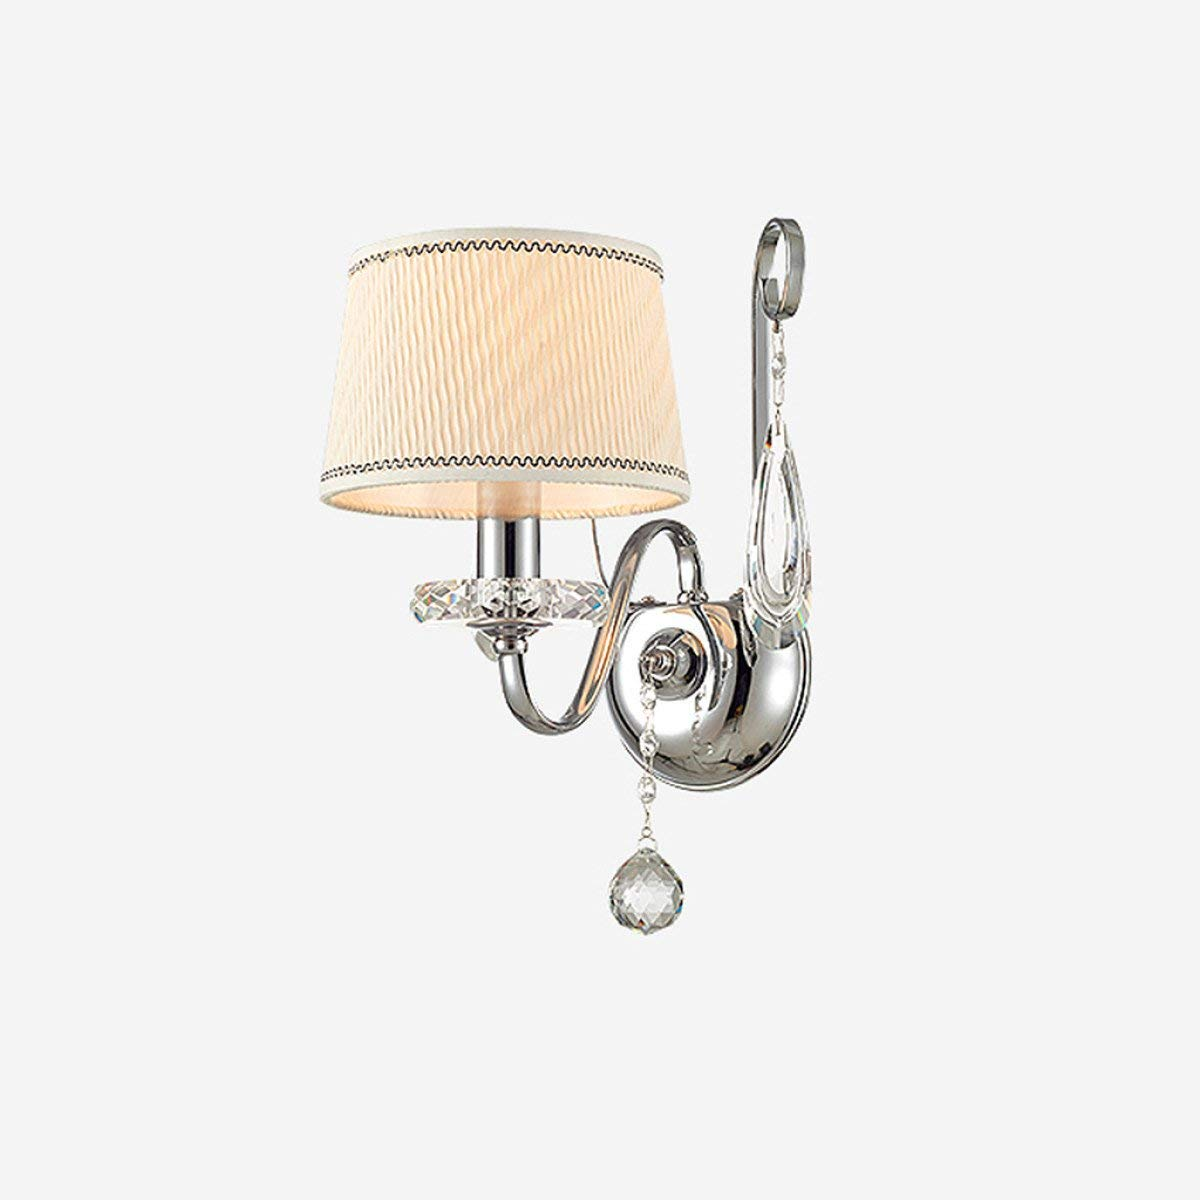 Homdox Solar Umbrella Lantern LED Light Garden Decor Lamp